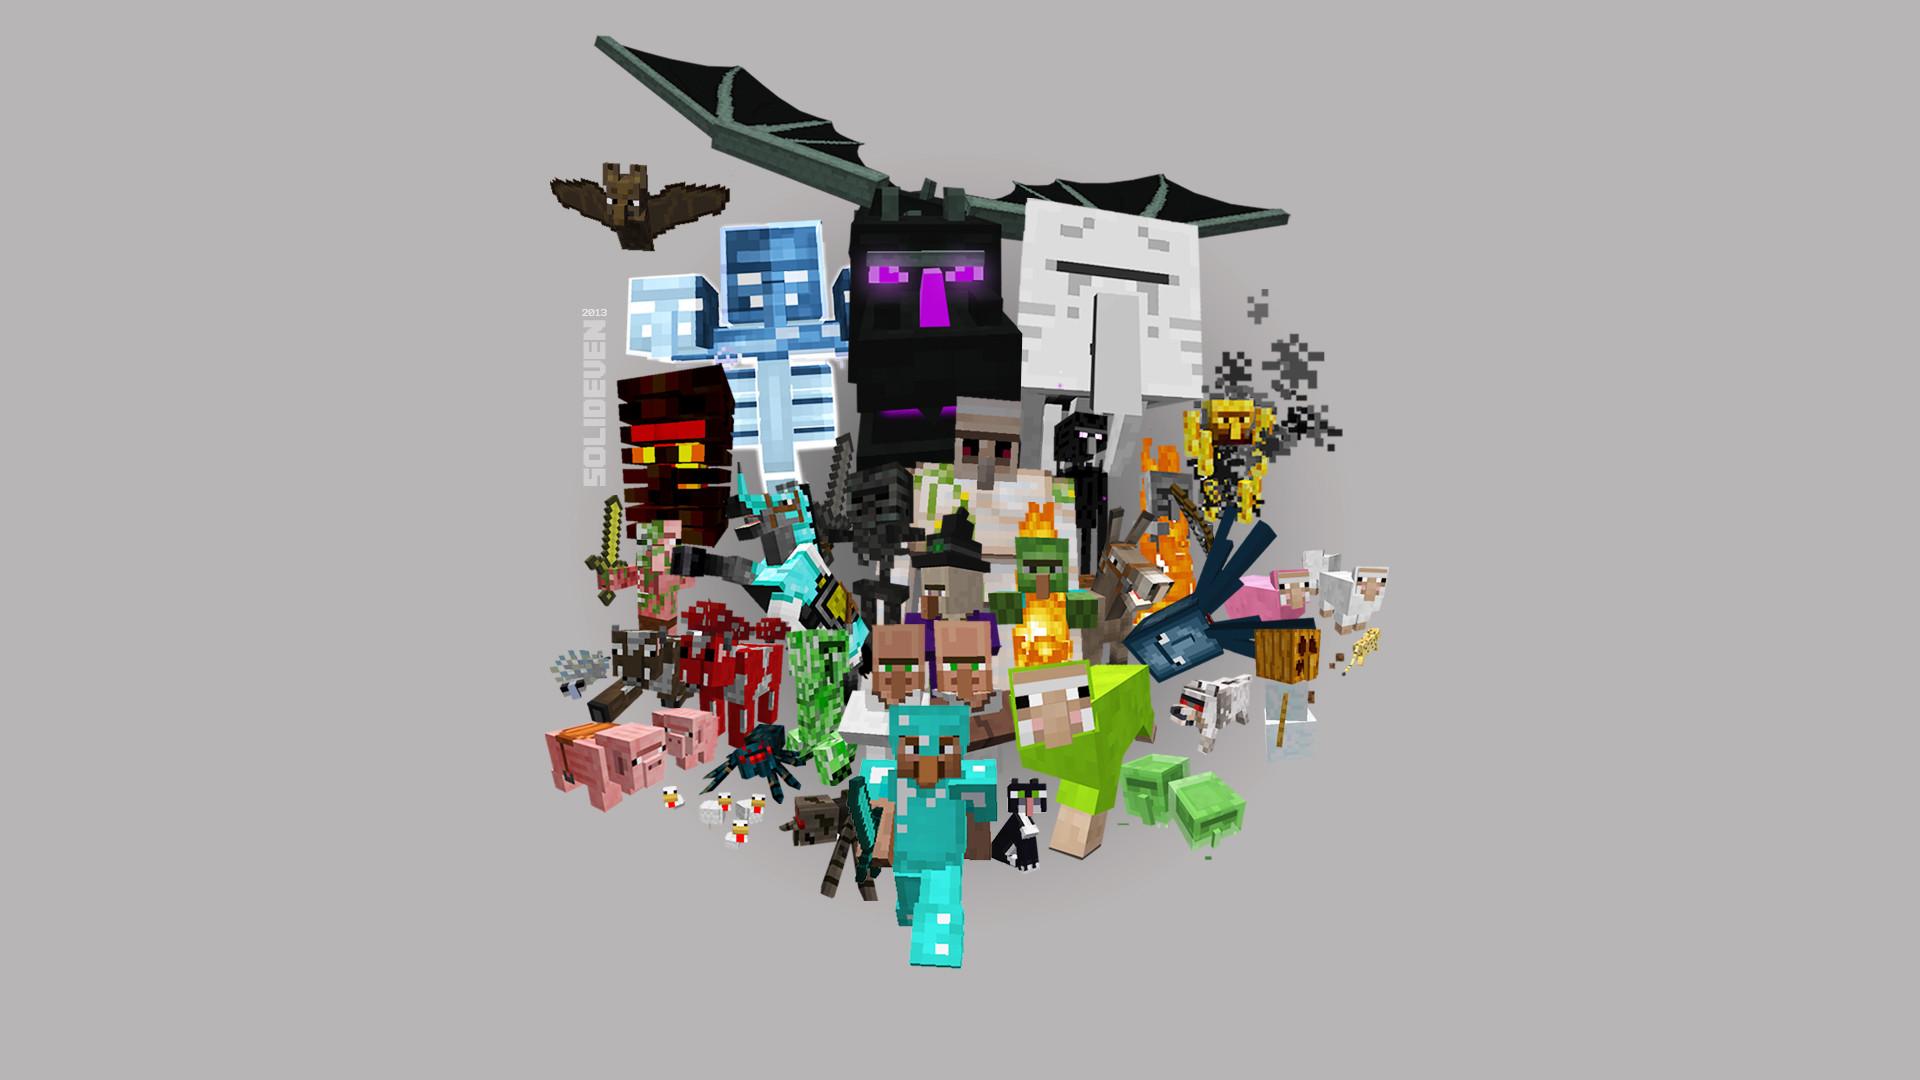 Minecraft wallpapers creator 33 wallpapers adorable - Minecraft wallpaper creator online ...